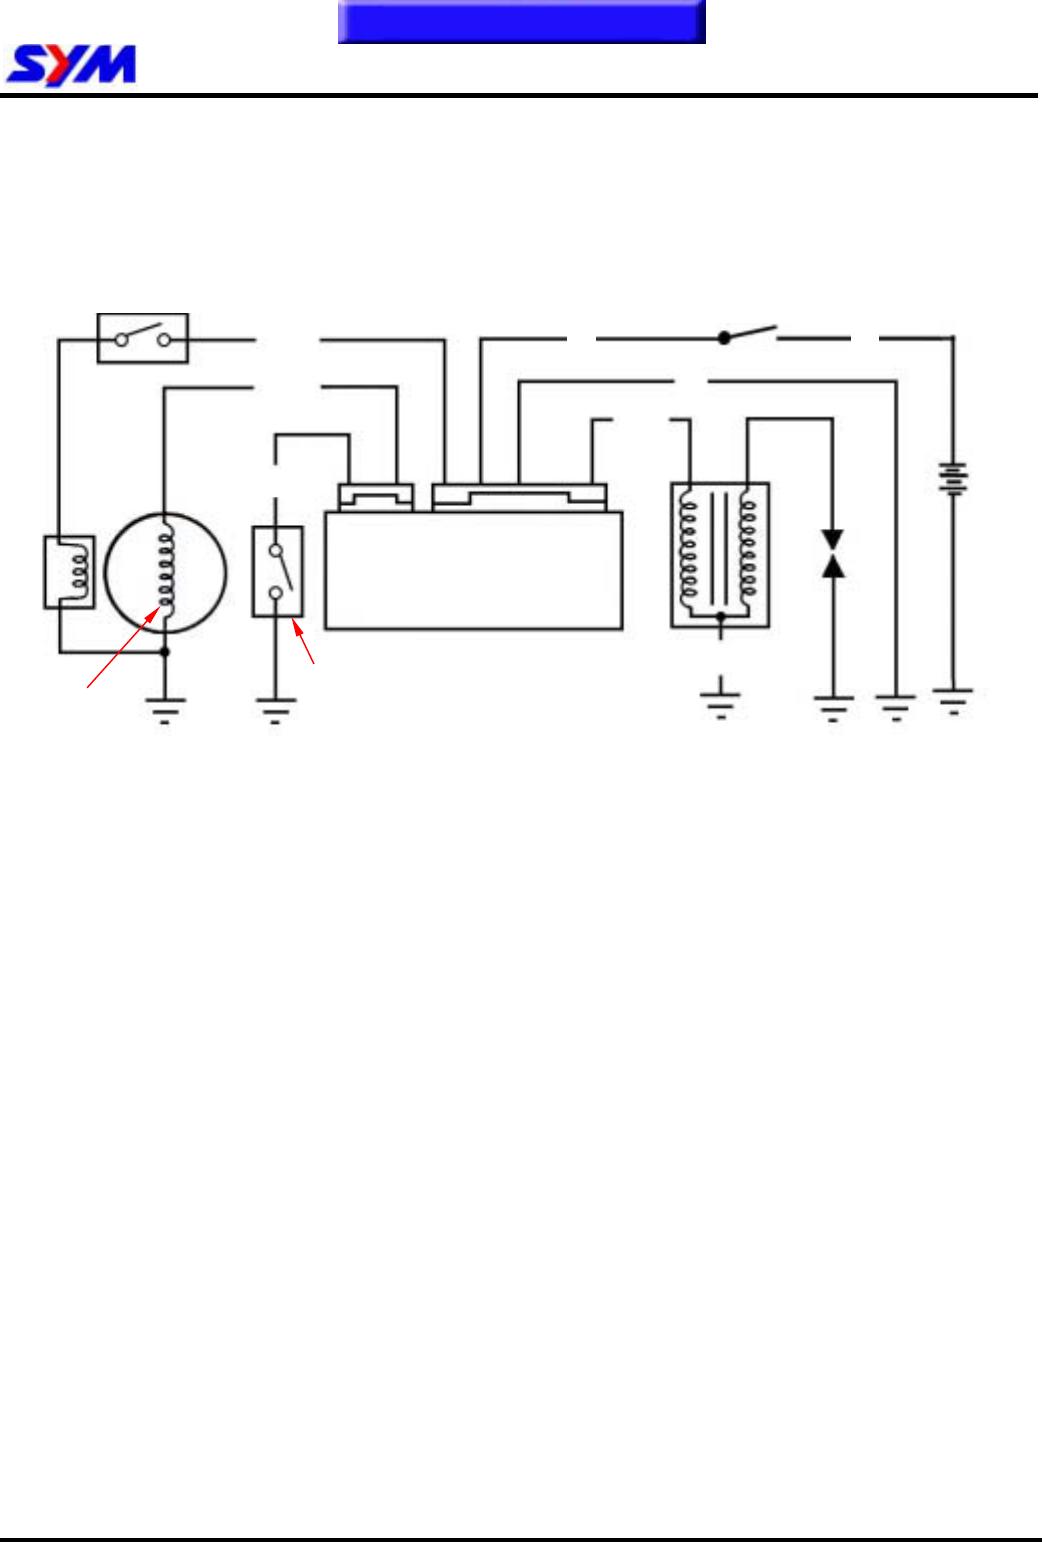 Phenomenal Wrg 5771 Sym Cdi Wiring Diagram Wiring Digital Resources Cettecompassionincorg